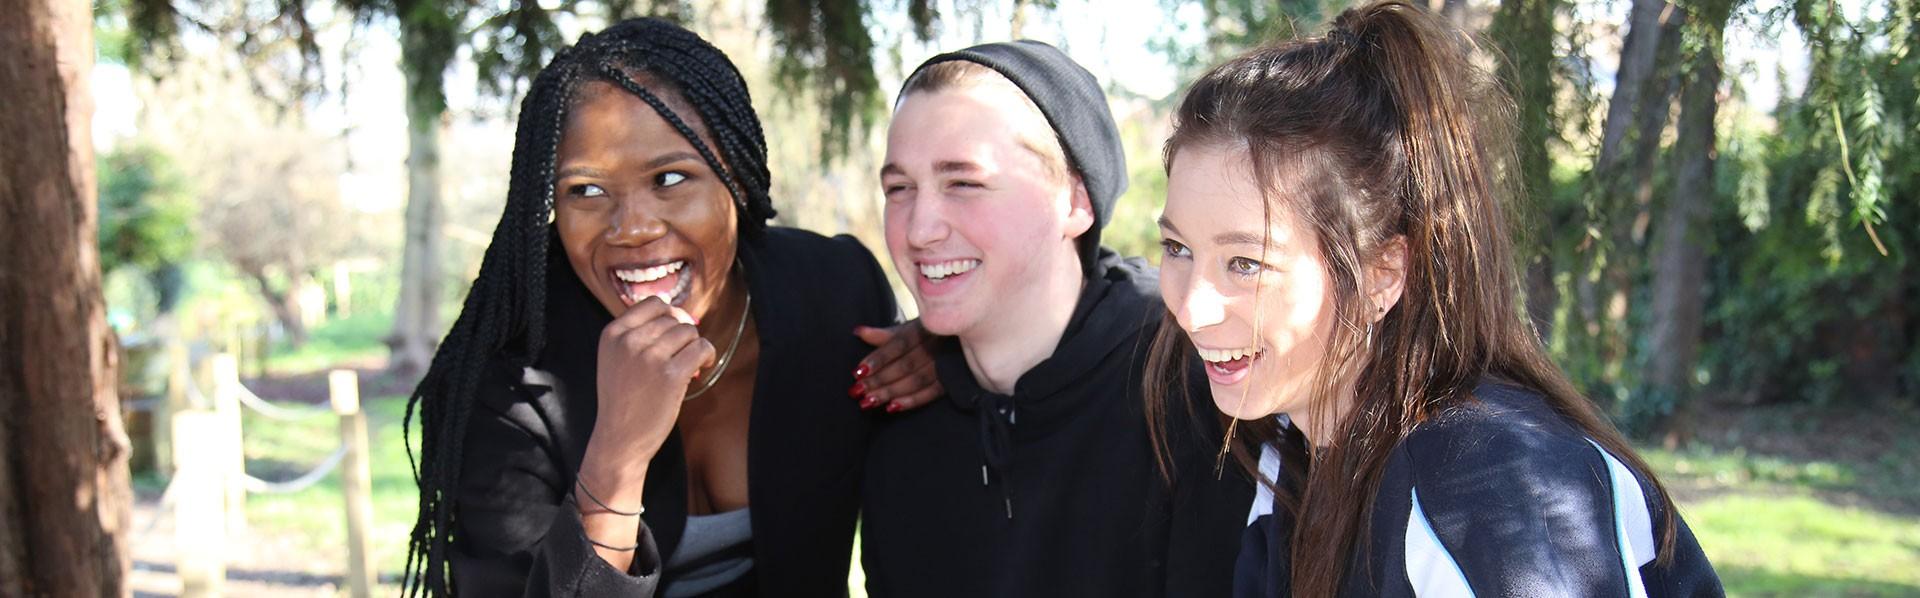 Educatius-UK-RochesterIndependentCollege-StudentsSmiling-Banner-2019